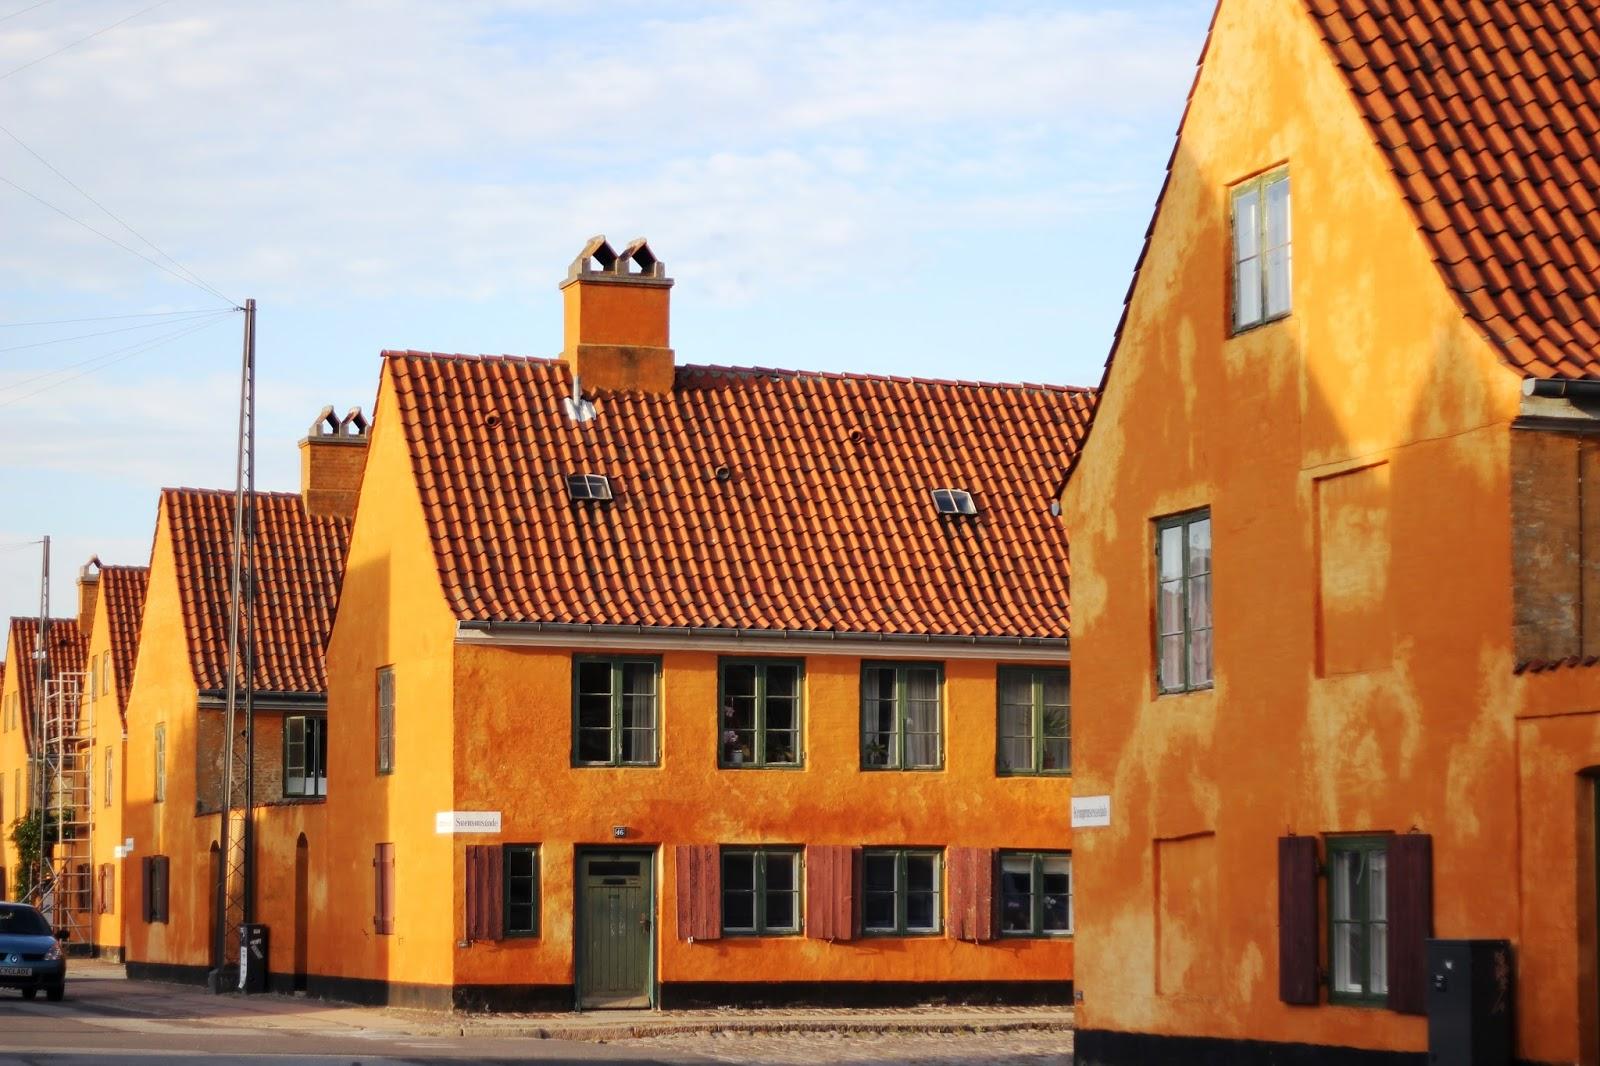 Ichigo Milky Yellow Brick Houses In Copenhagen